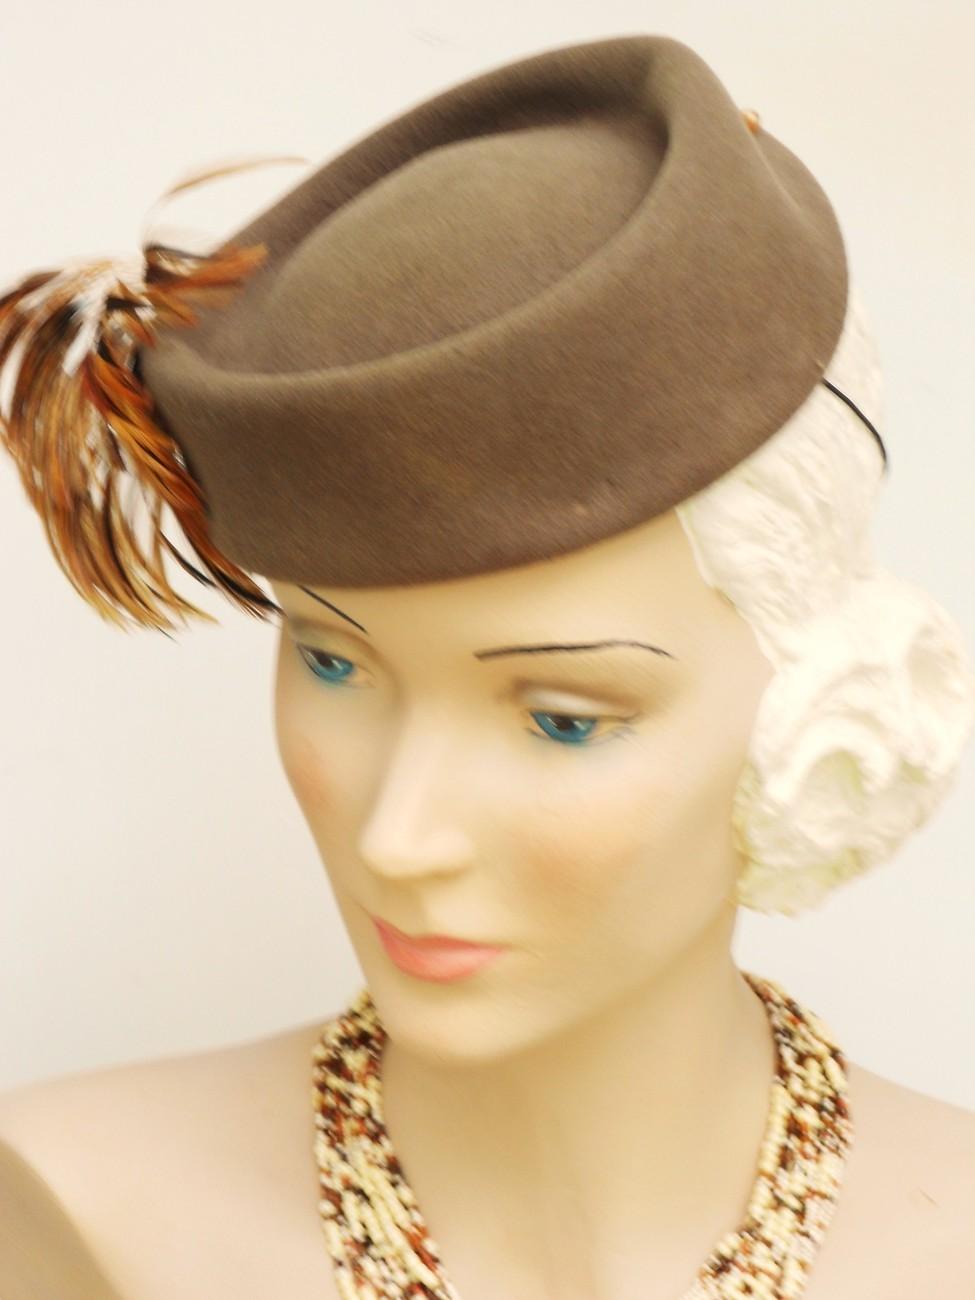 Vtg 40s Hat  Tilt WWII Asymetrical Pill Box Striking  Rhinestoned Feather Spray